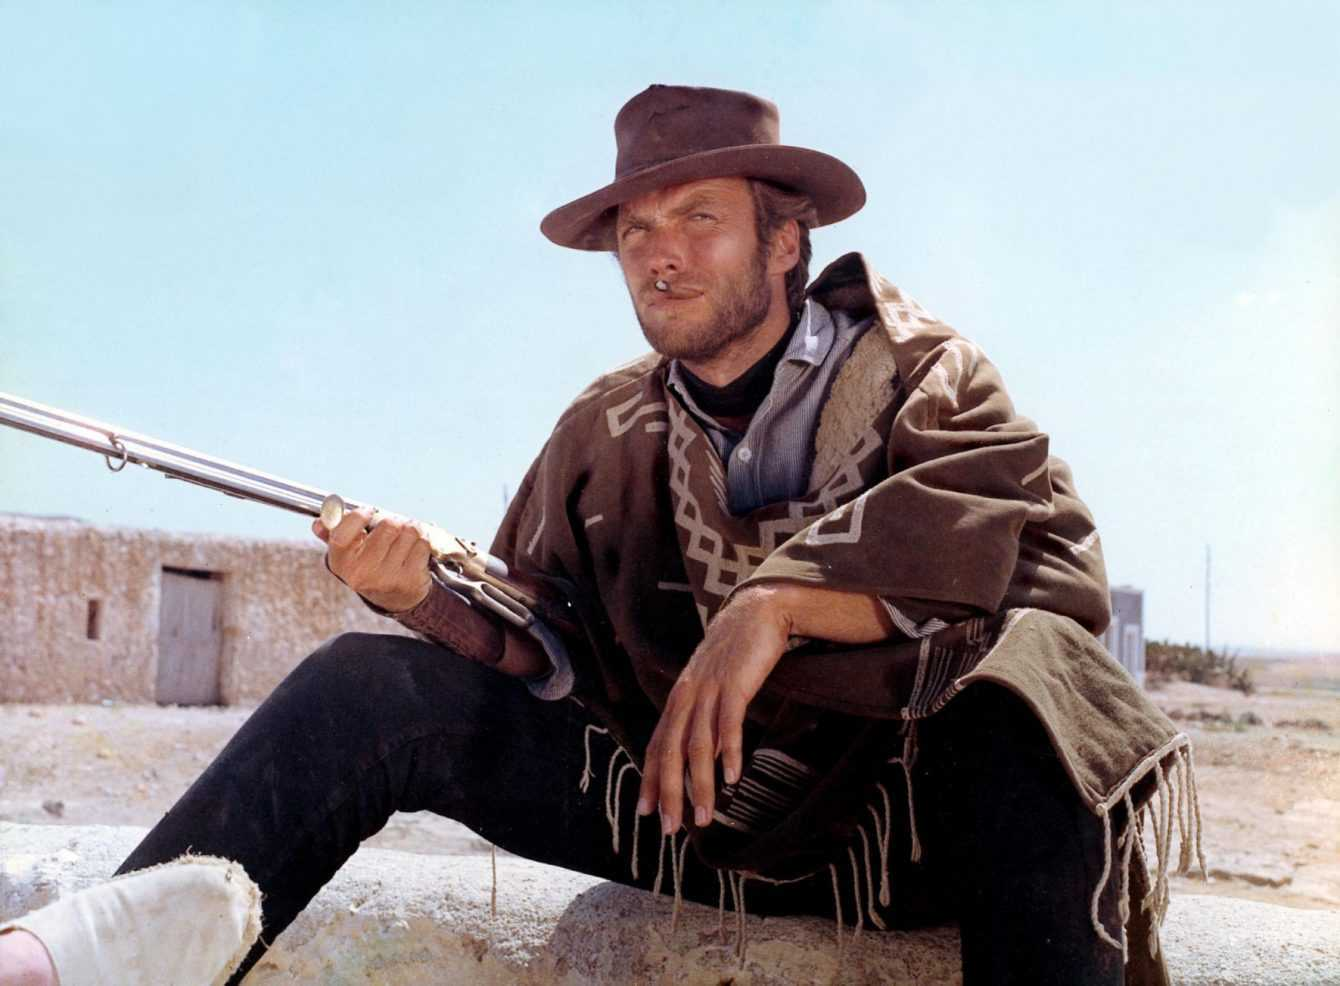 Clint Eastwood, il West in persona: oggi compie 90 anni